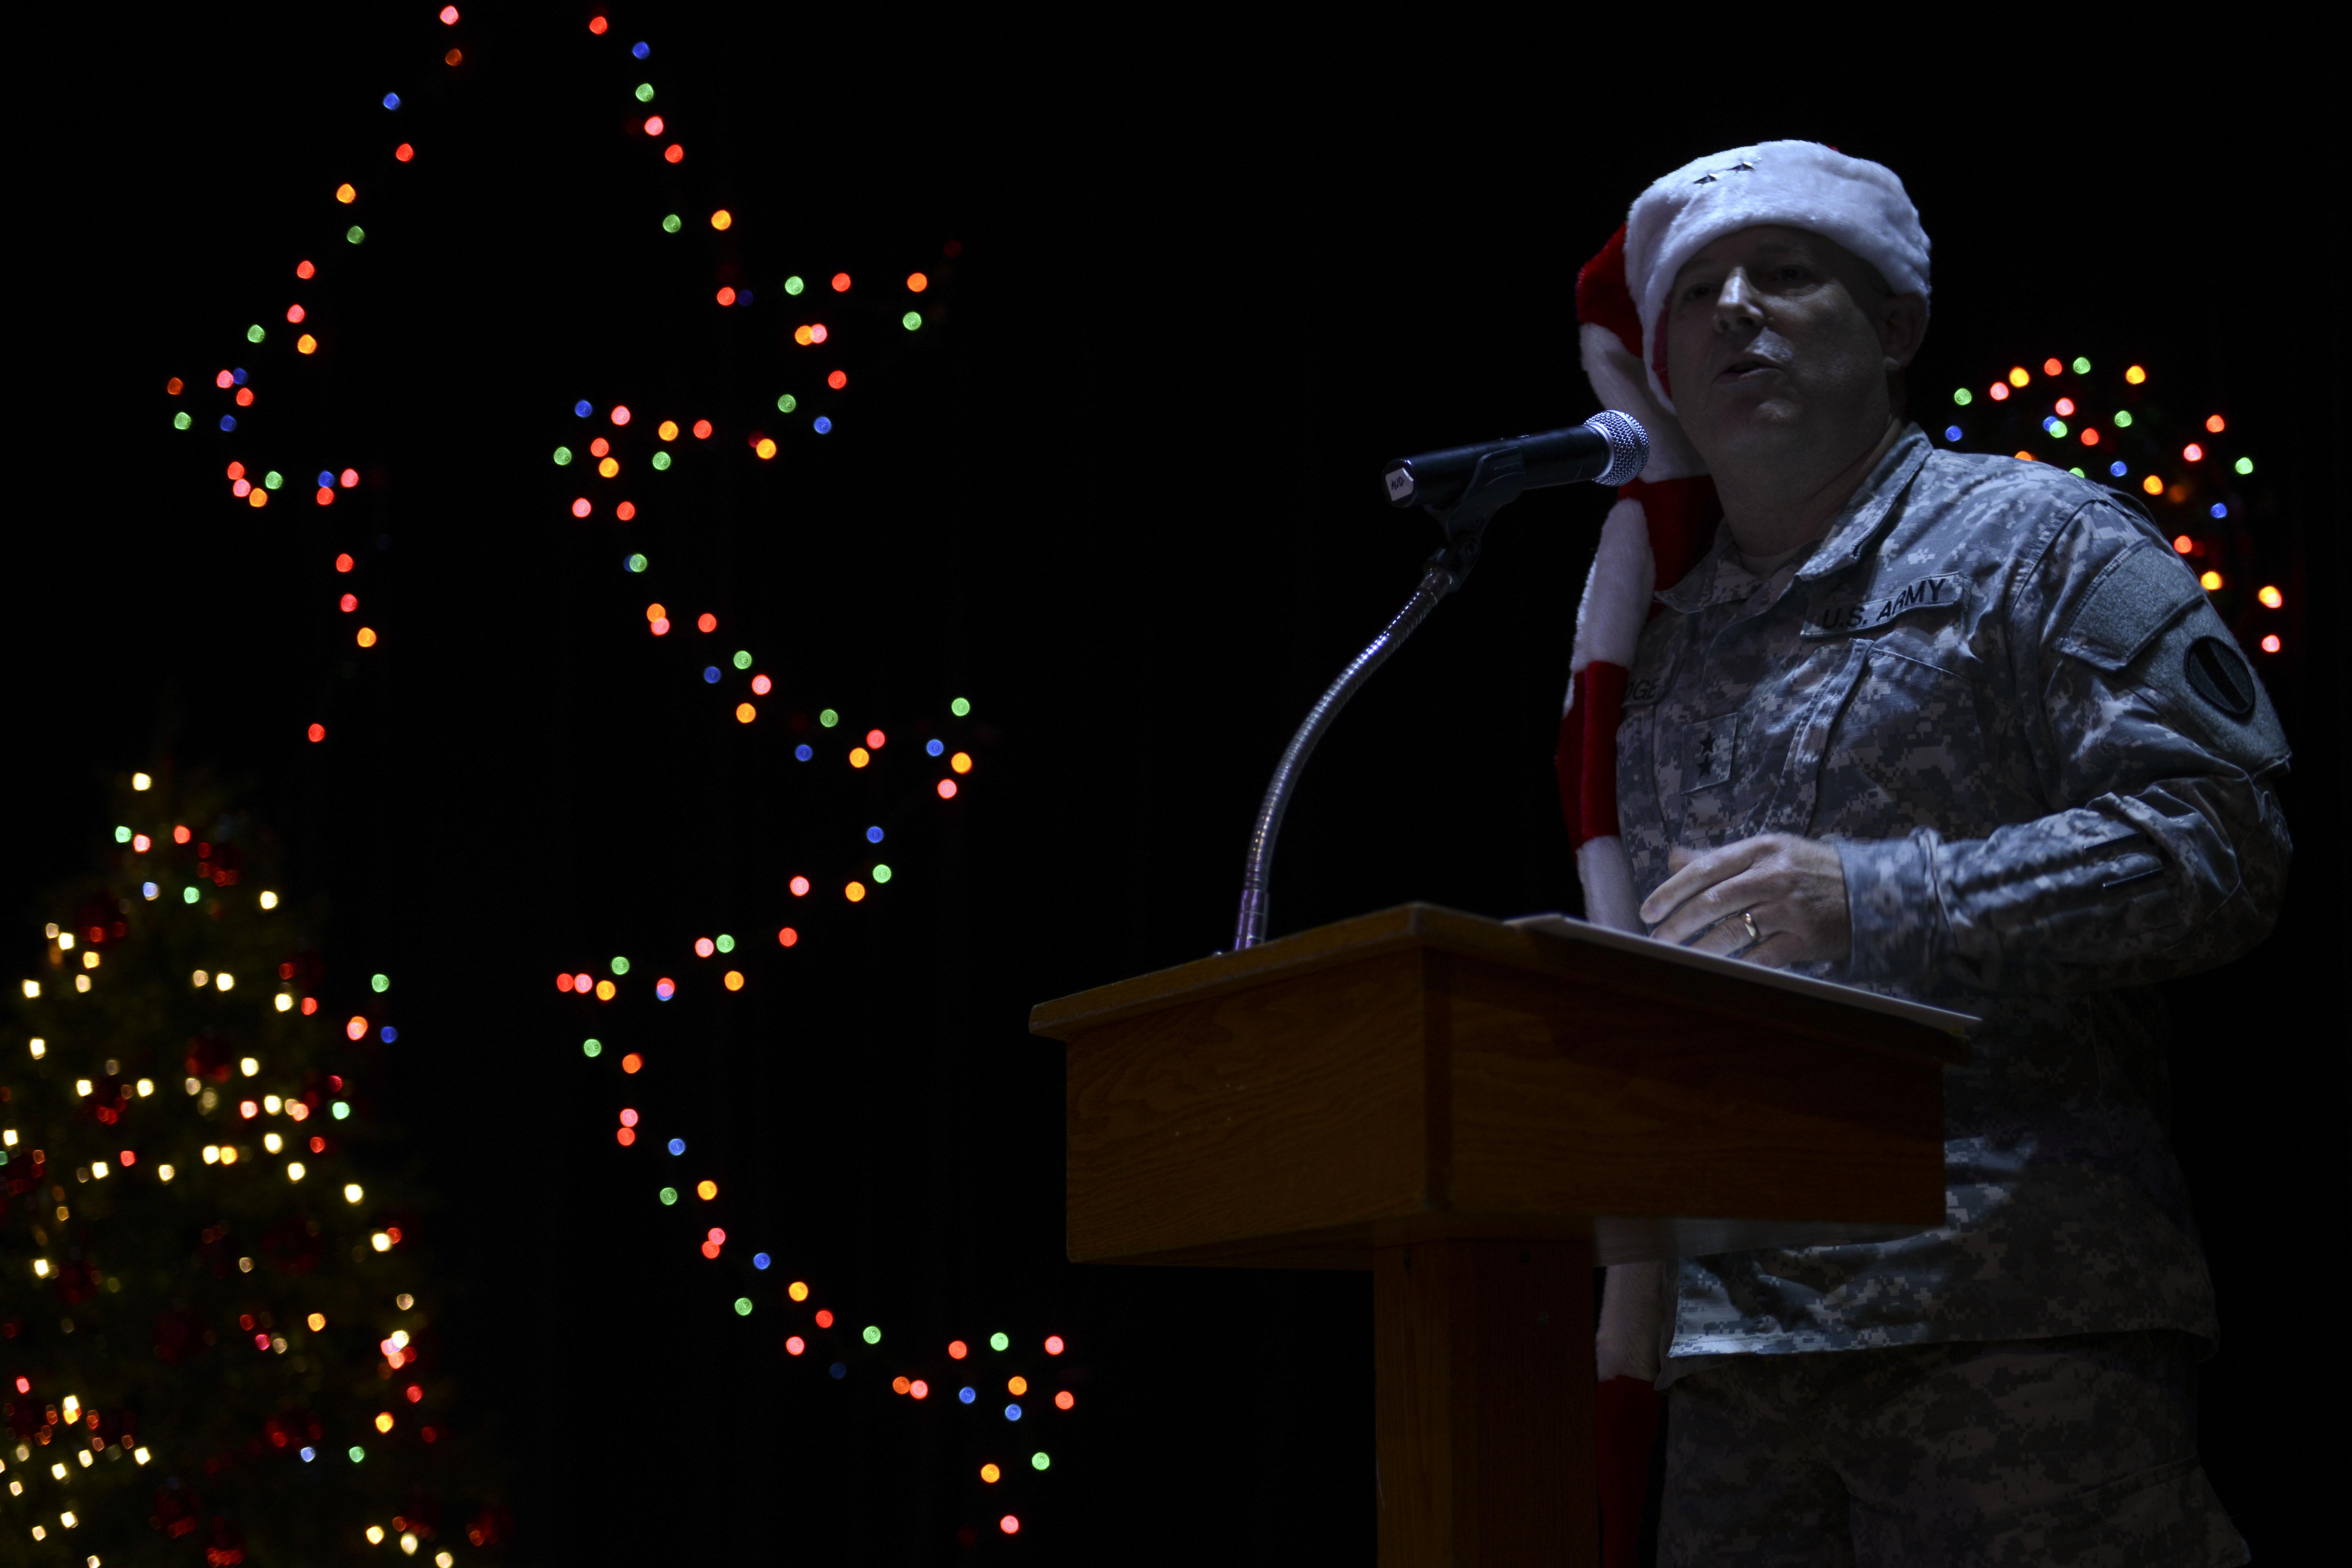 Eustis Christmas Celebration Lights Up The Night Joint Base Langley Eustis Article Display